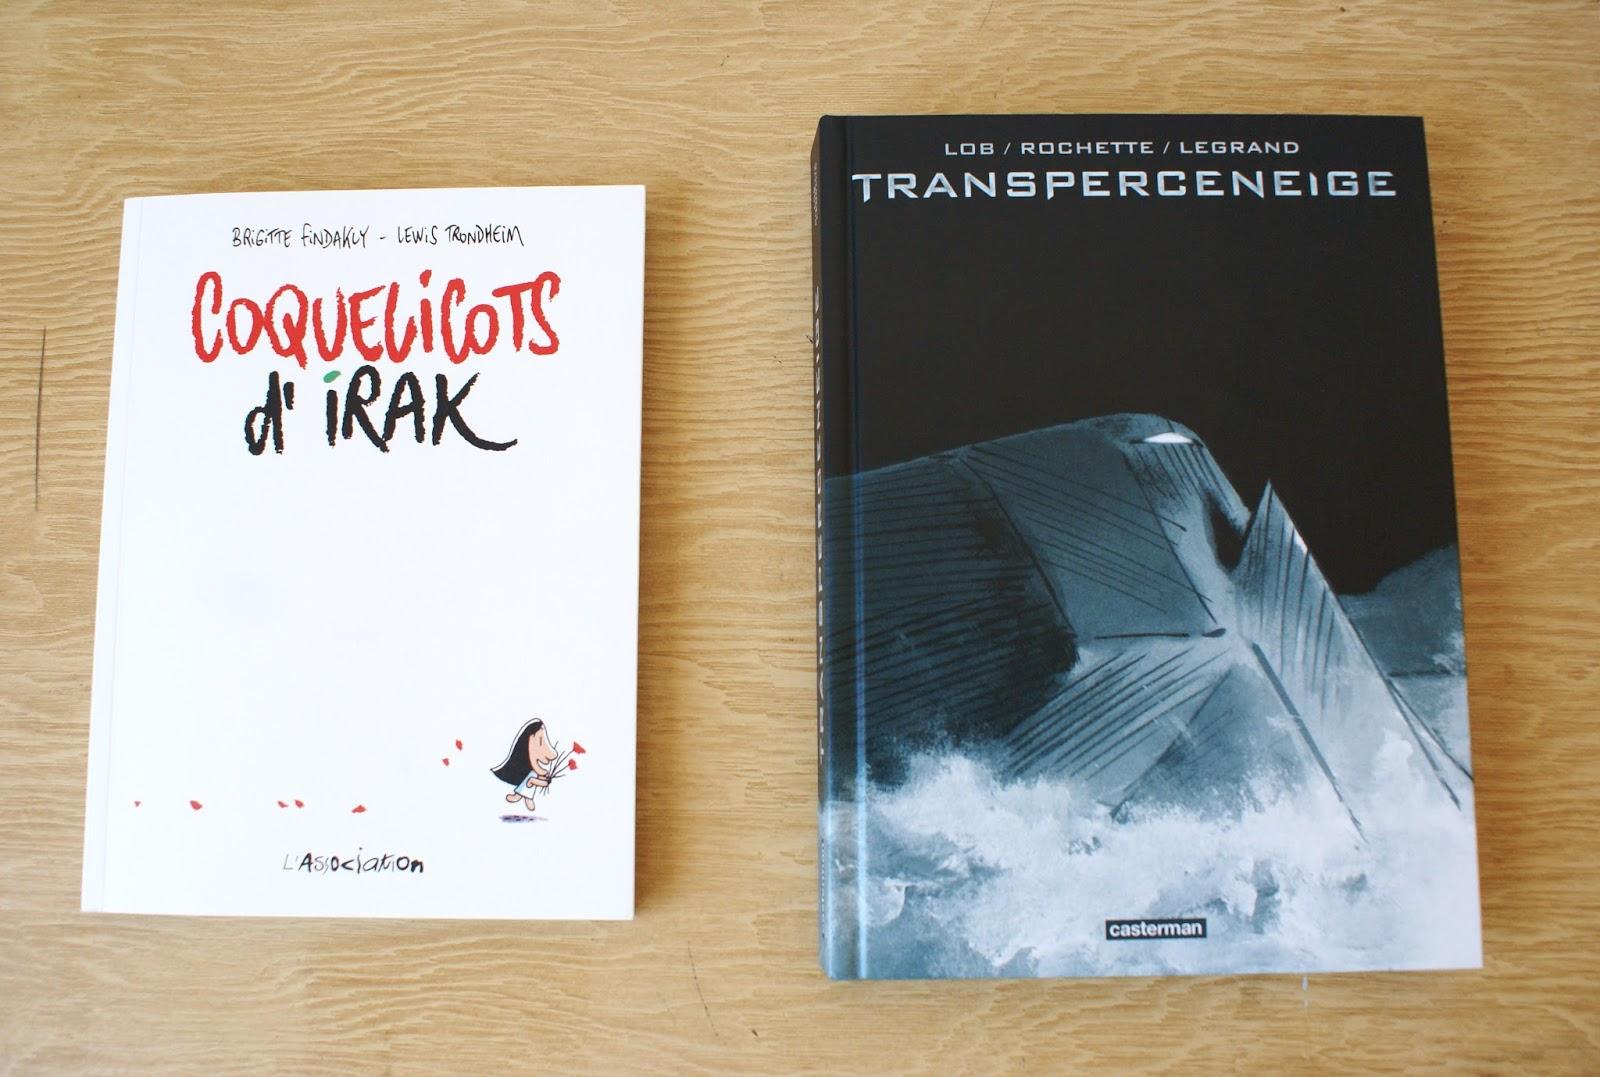 coquelicots d'irak findakly trondheim transperceneige rochette lob legrand bd graphic novel books livres